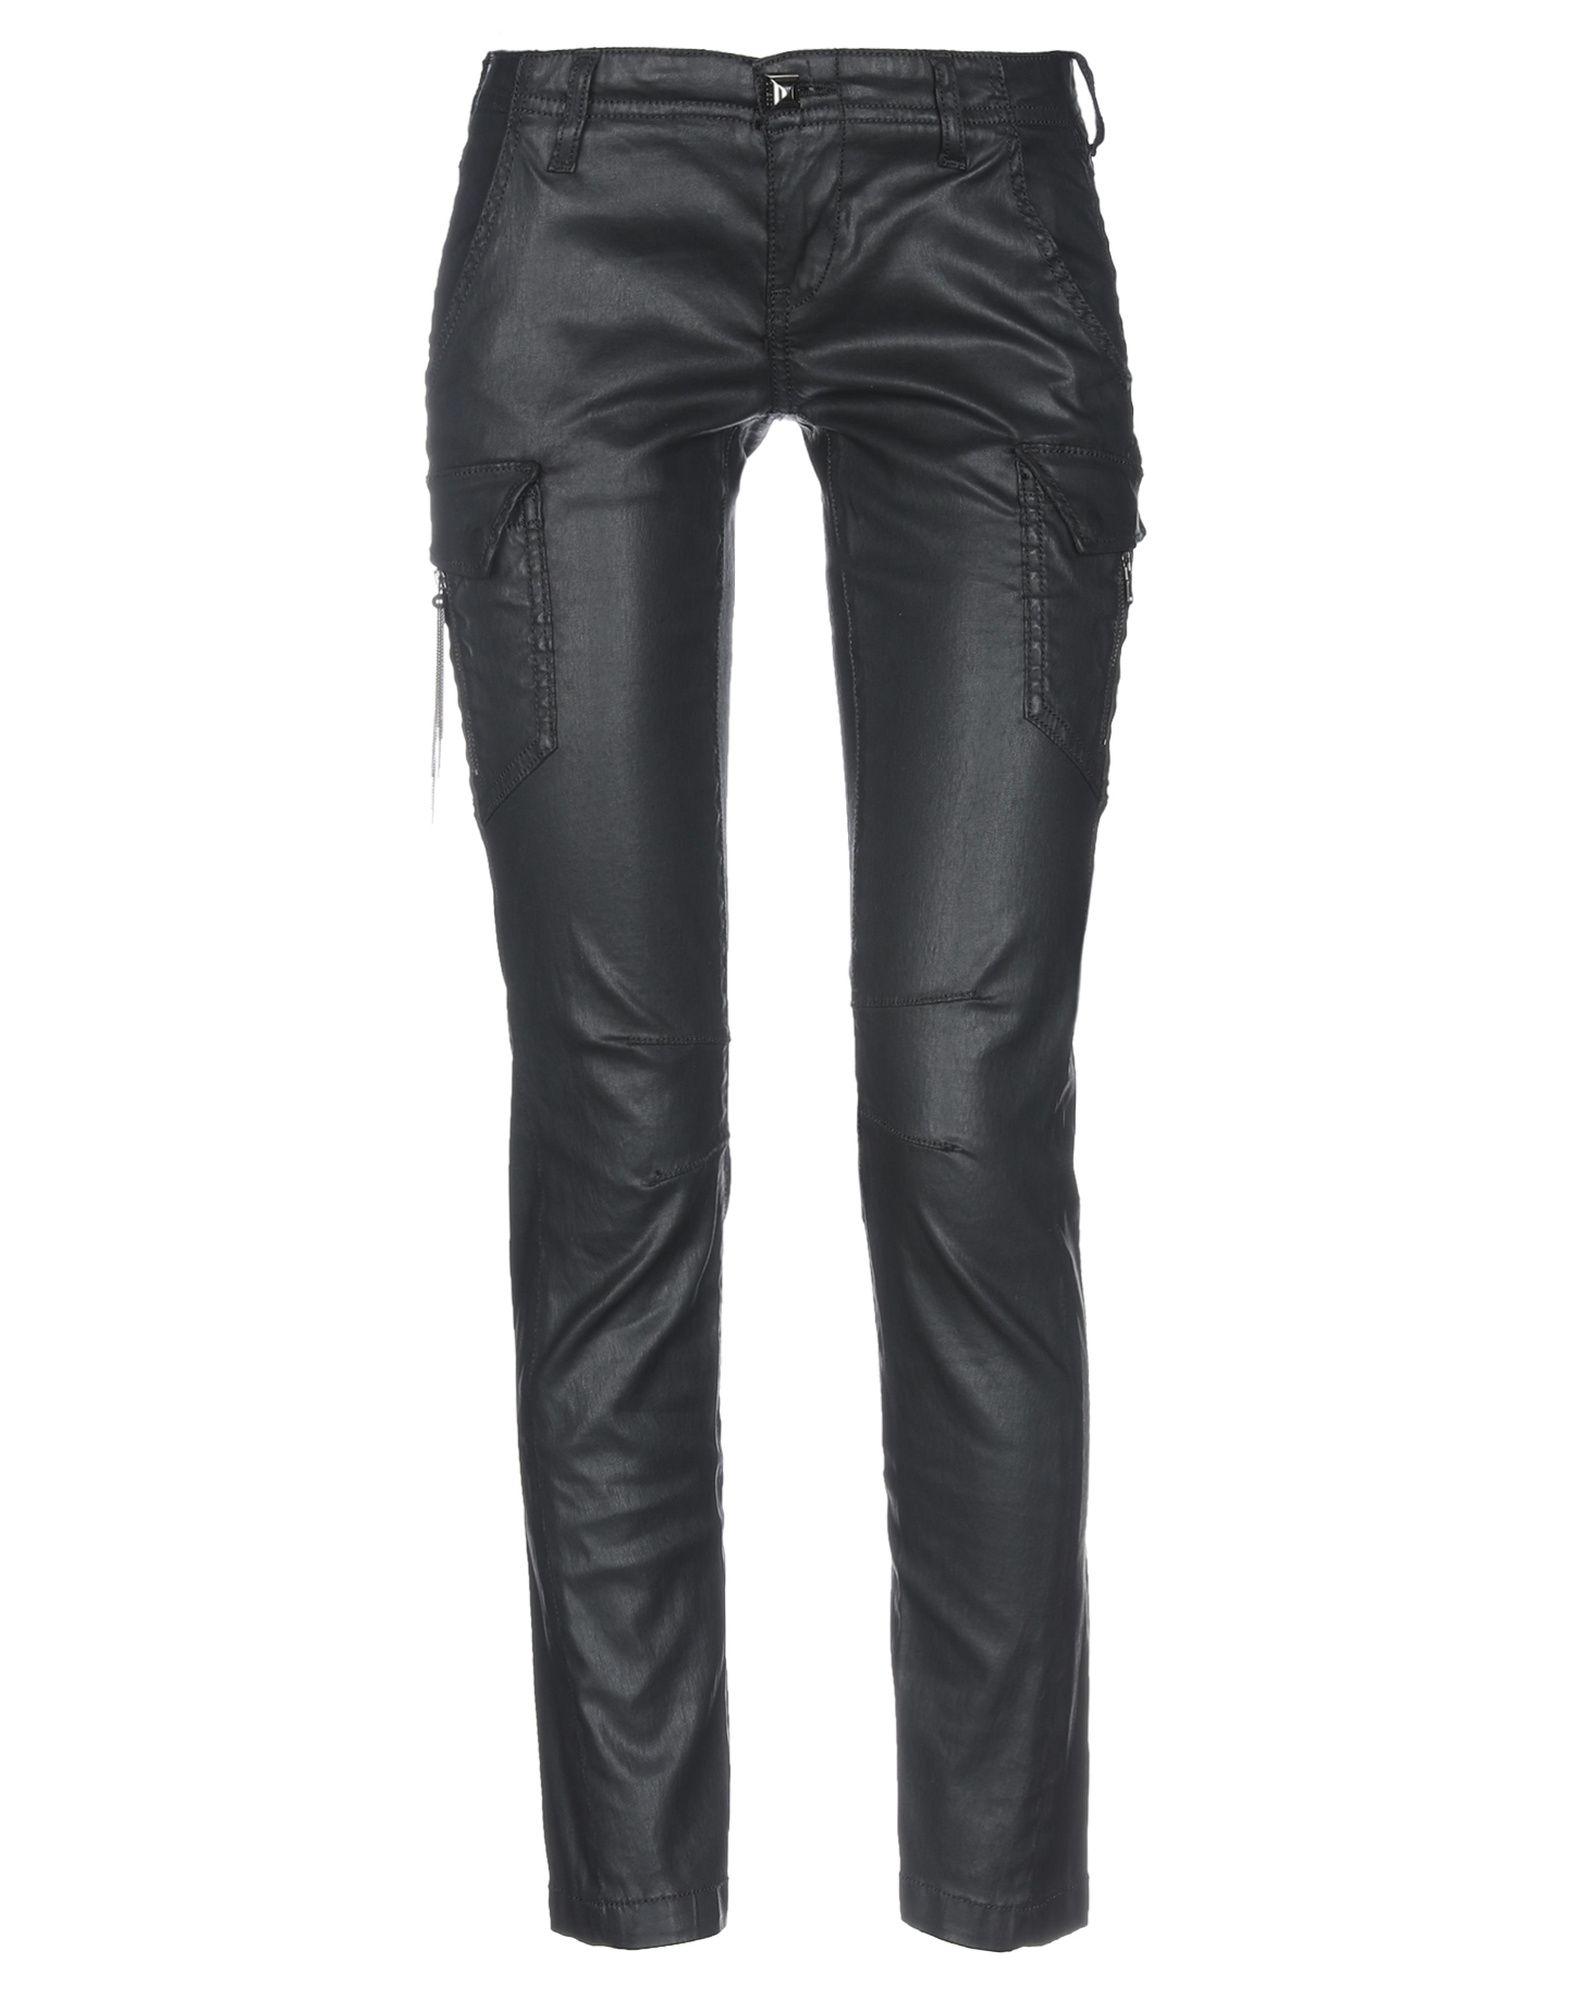 GUESS Damen Jeanshose2 schwarz